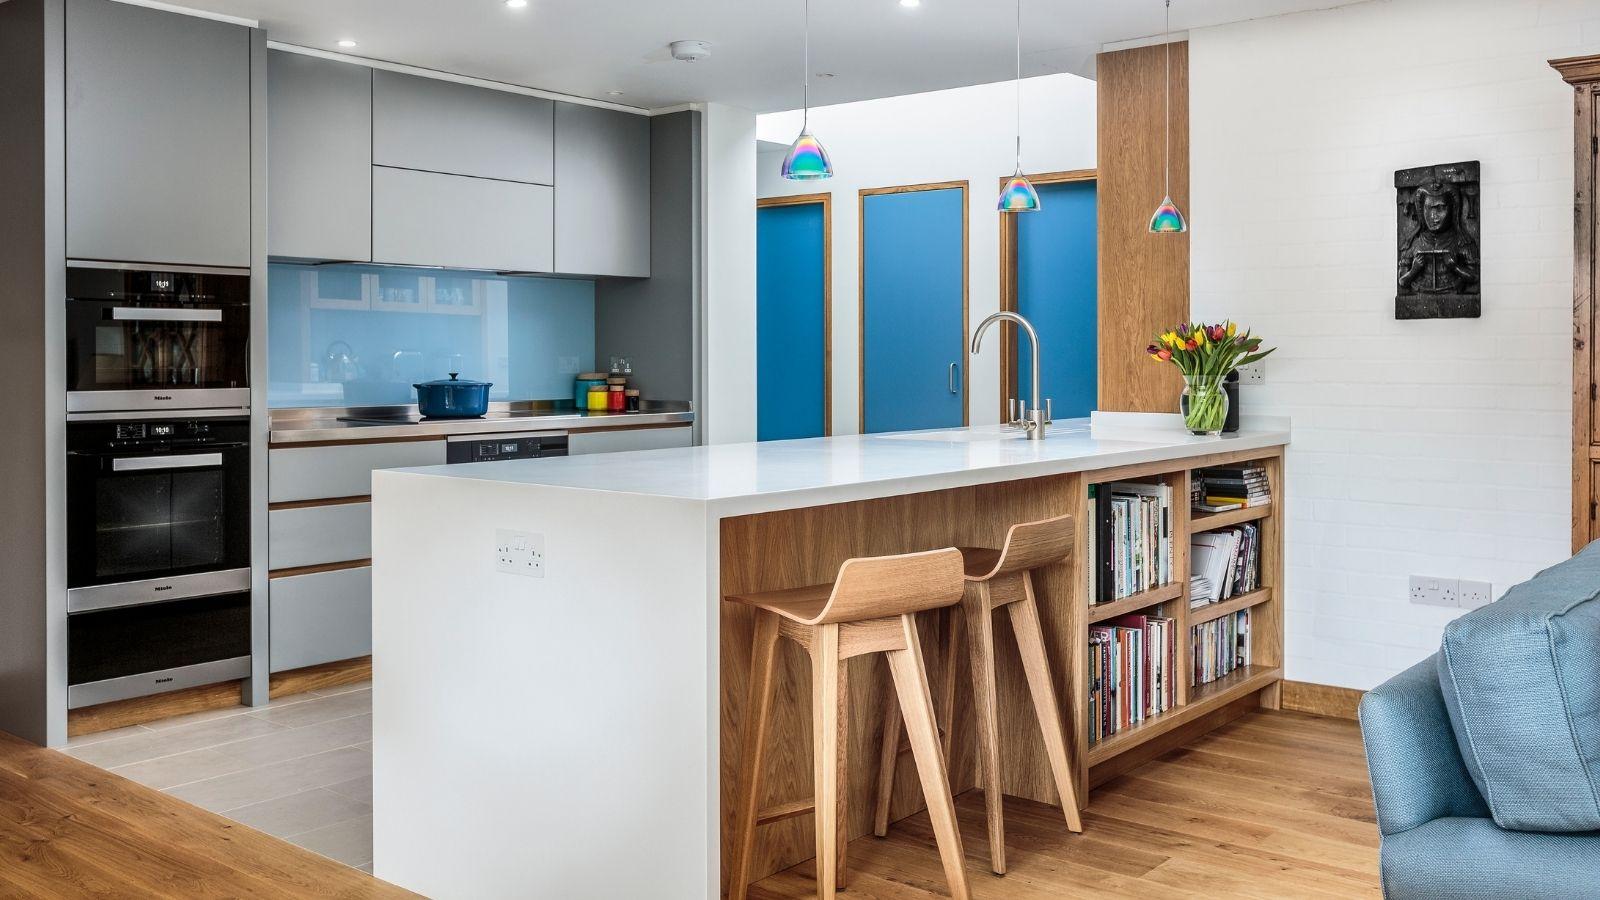 open plan kitchen design ideas from Kestrel Kitchens